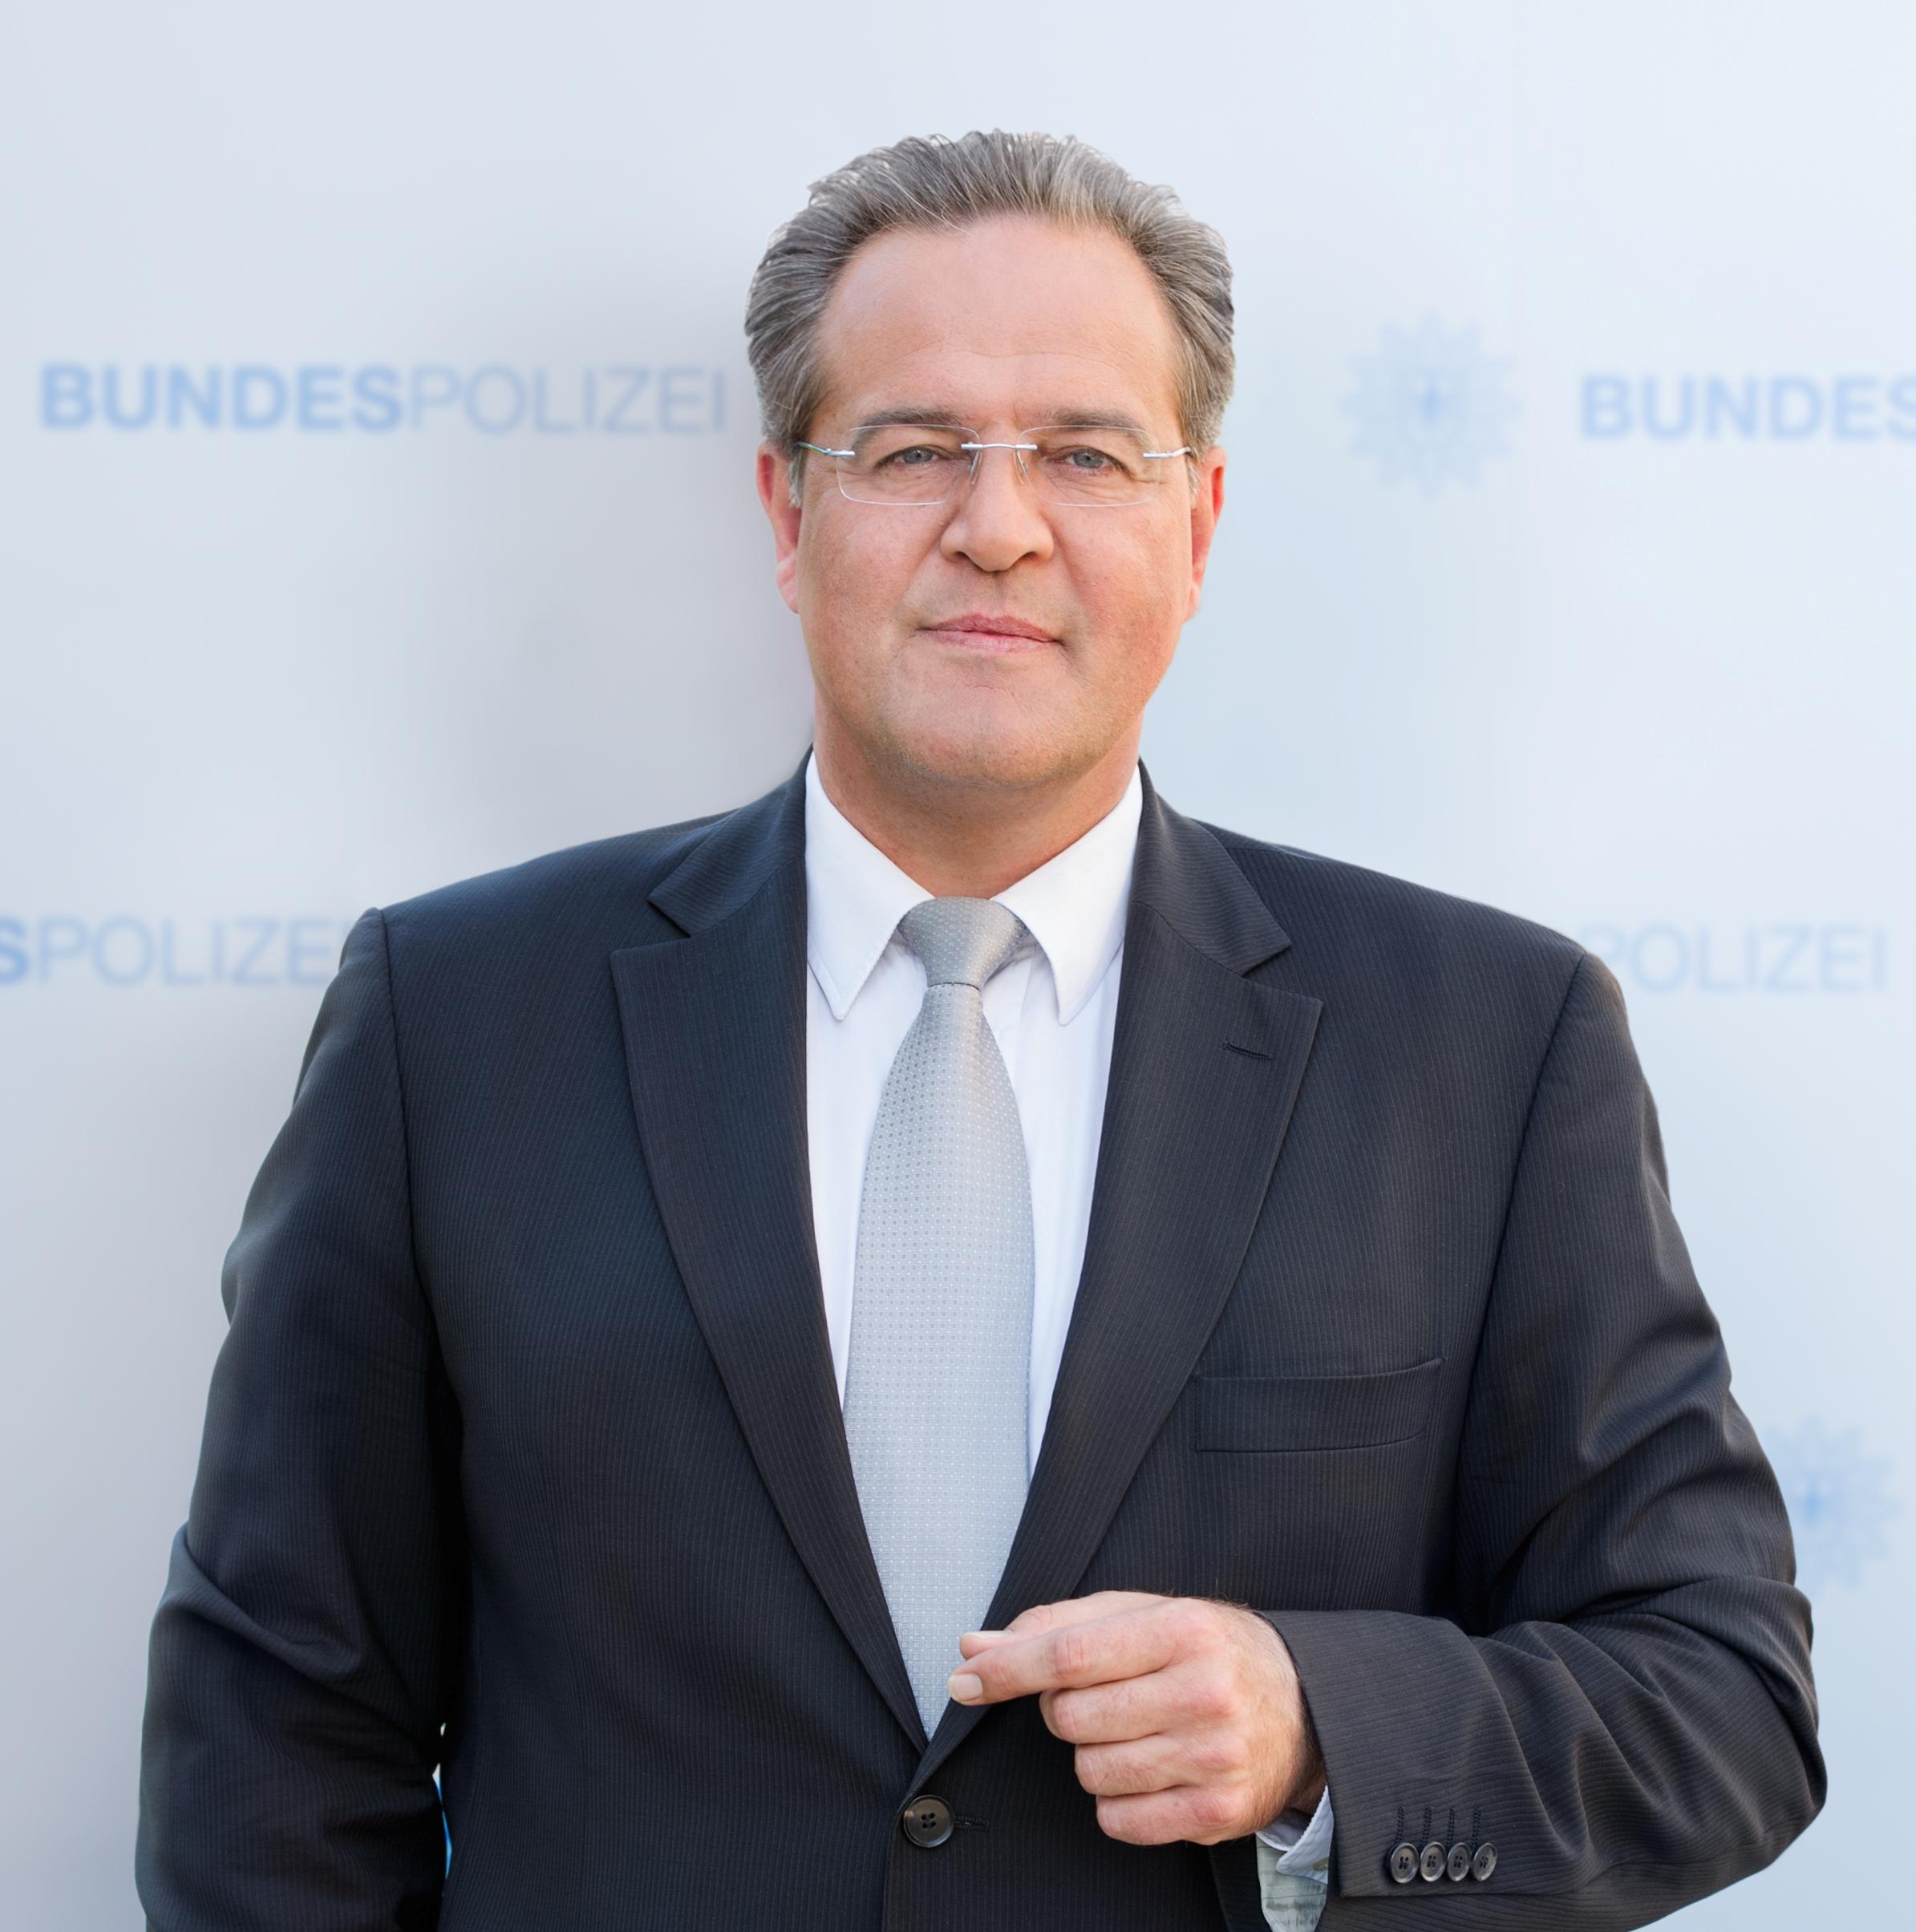 Zeuge Dieter Romann via bundespolizei.de